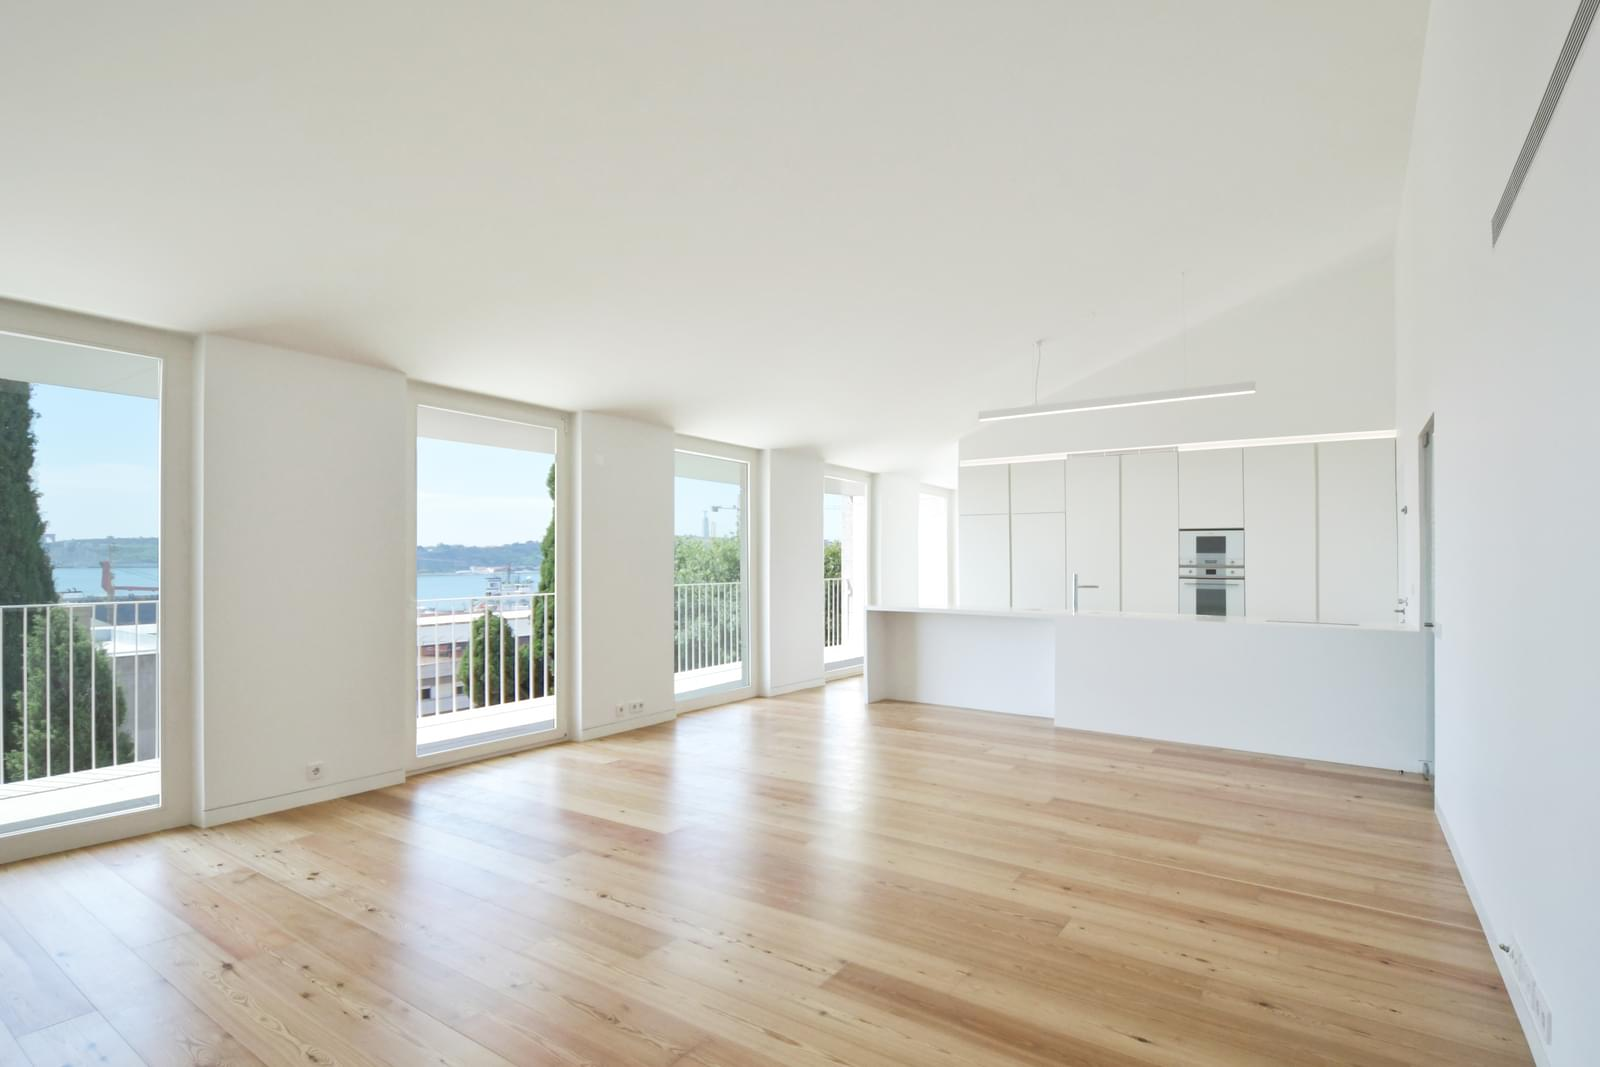 pf18051-apartamento-t4-lisboa-e67dd802-503b-422c-b983-1339c89c70c0